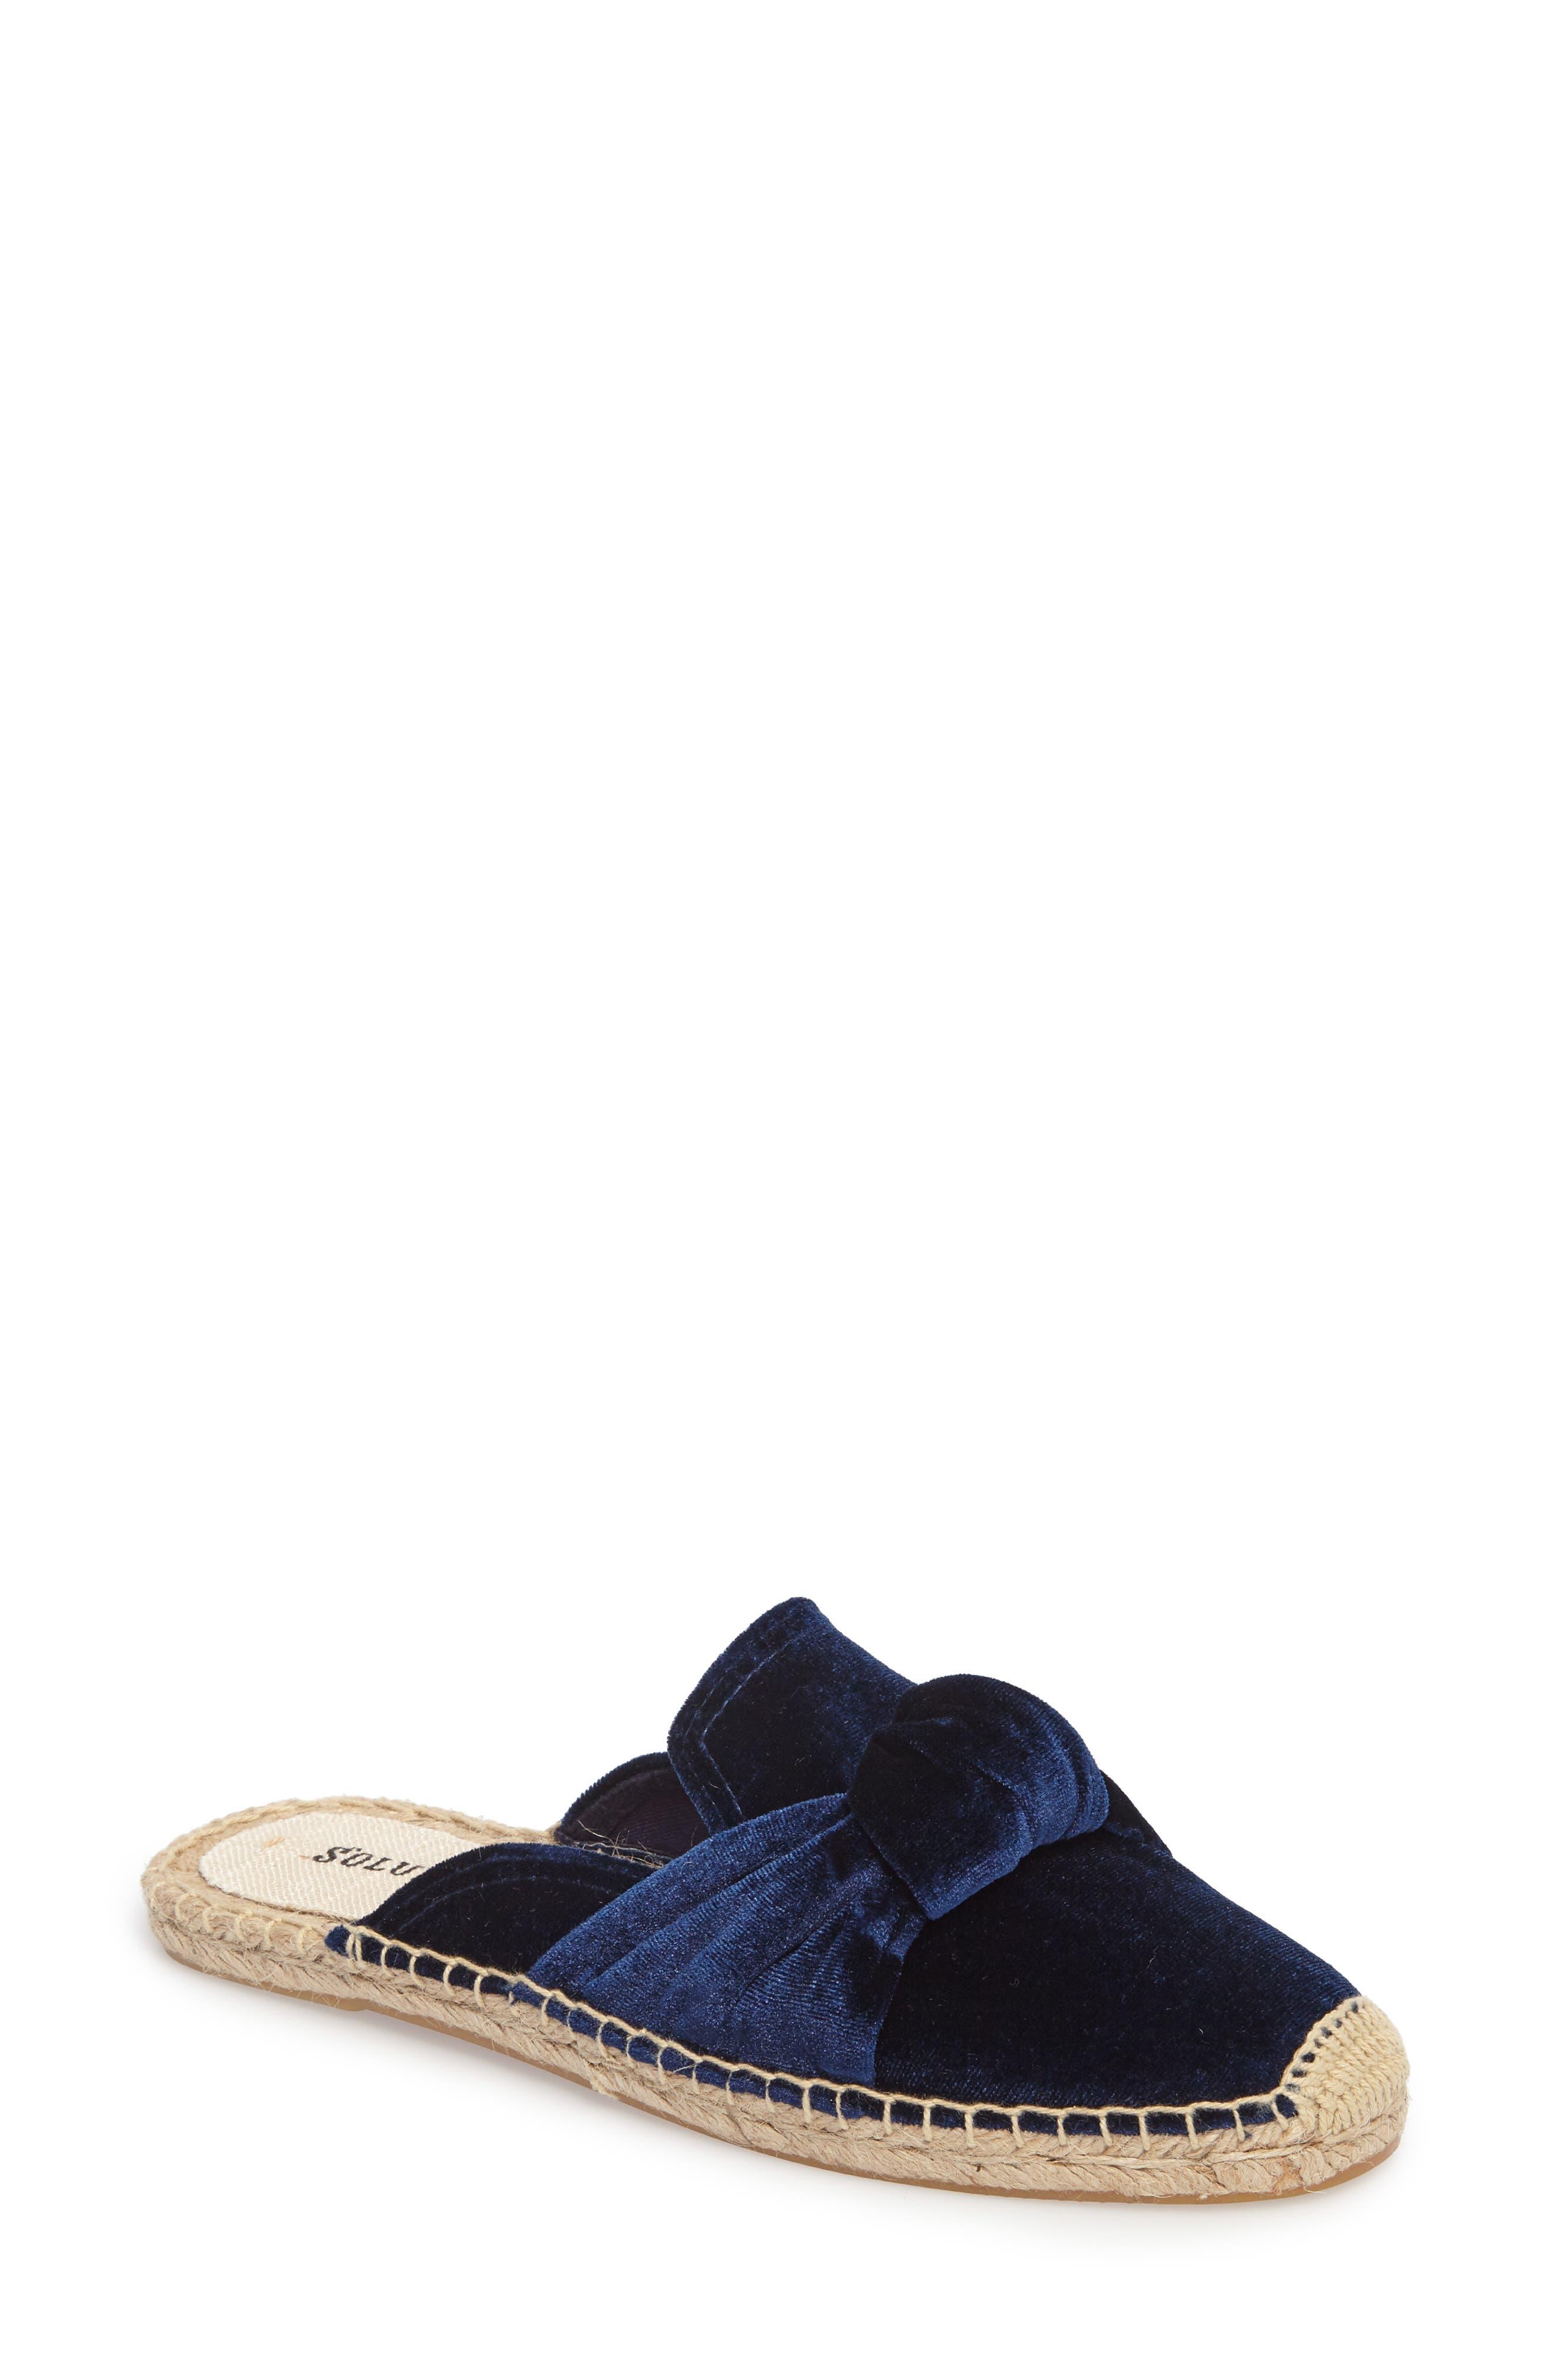 Alternate Image 1 Selected - Soludos Knotted Velvet Loafer Mule (Women)